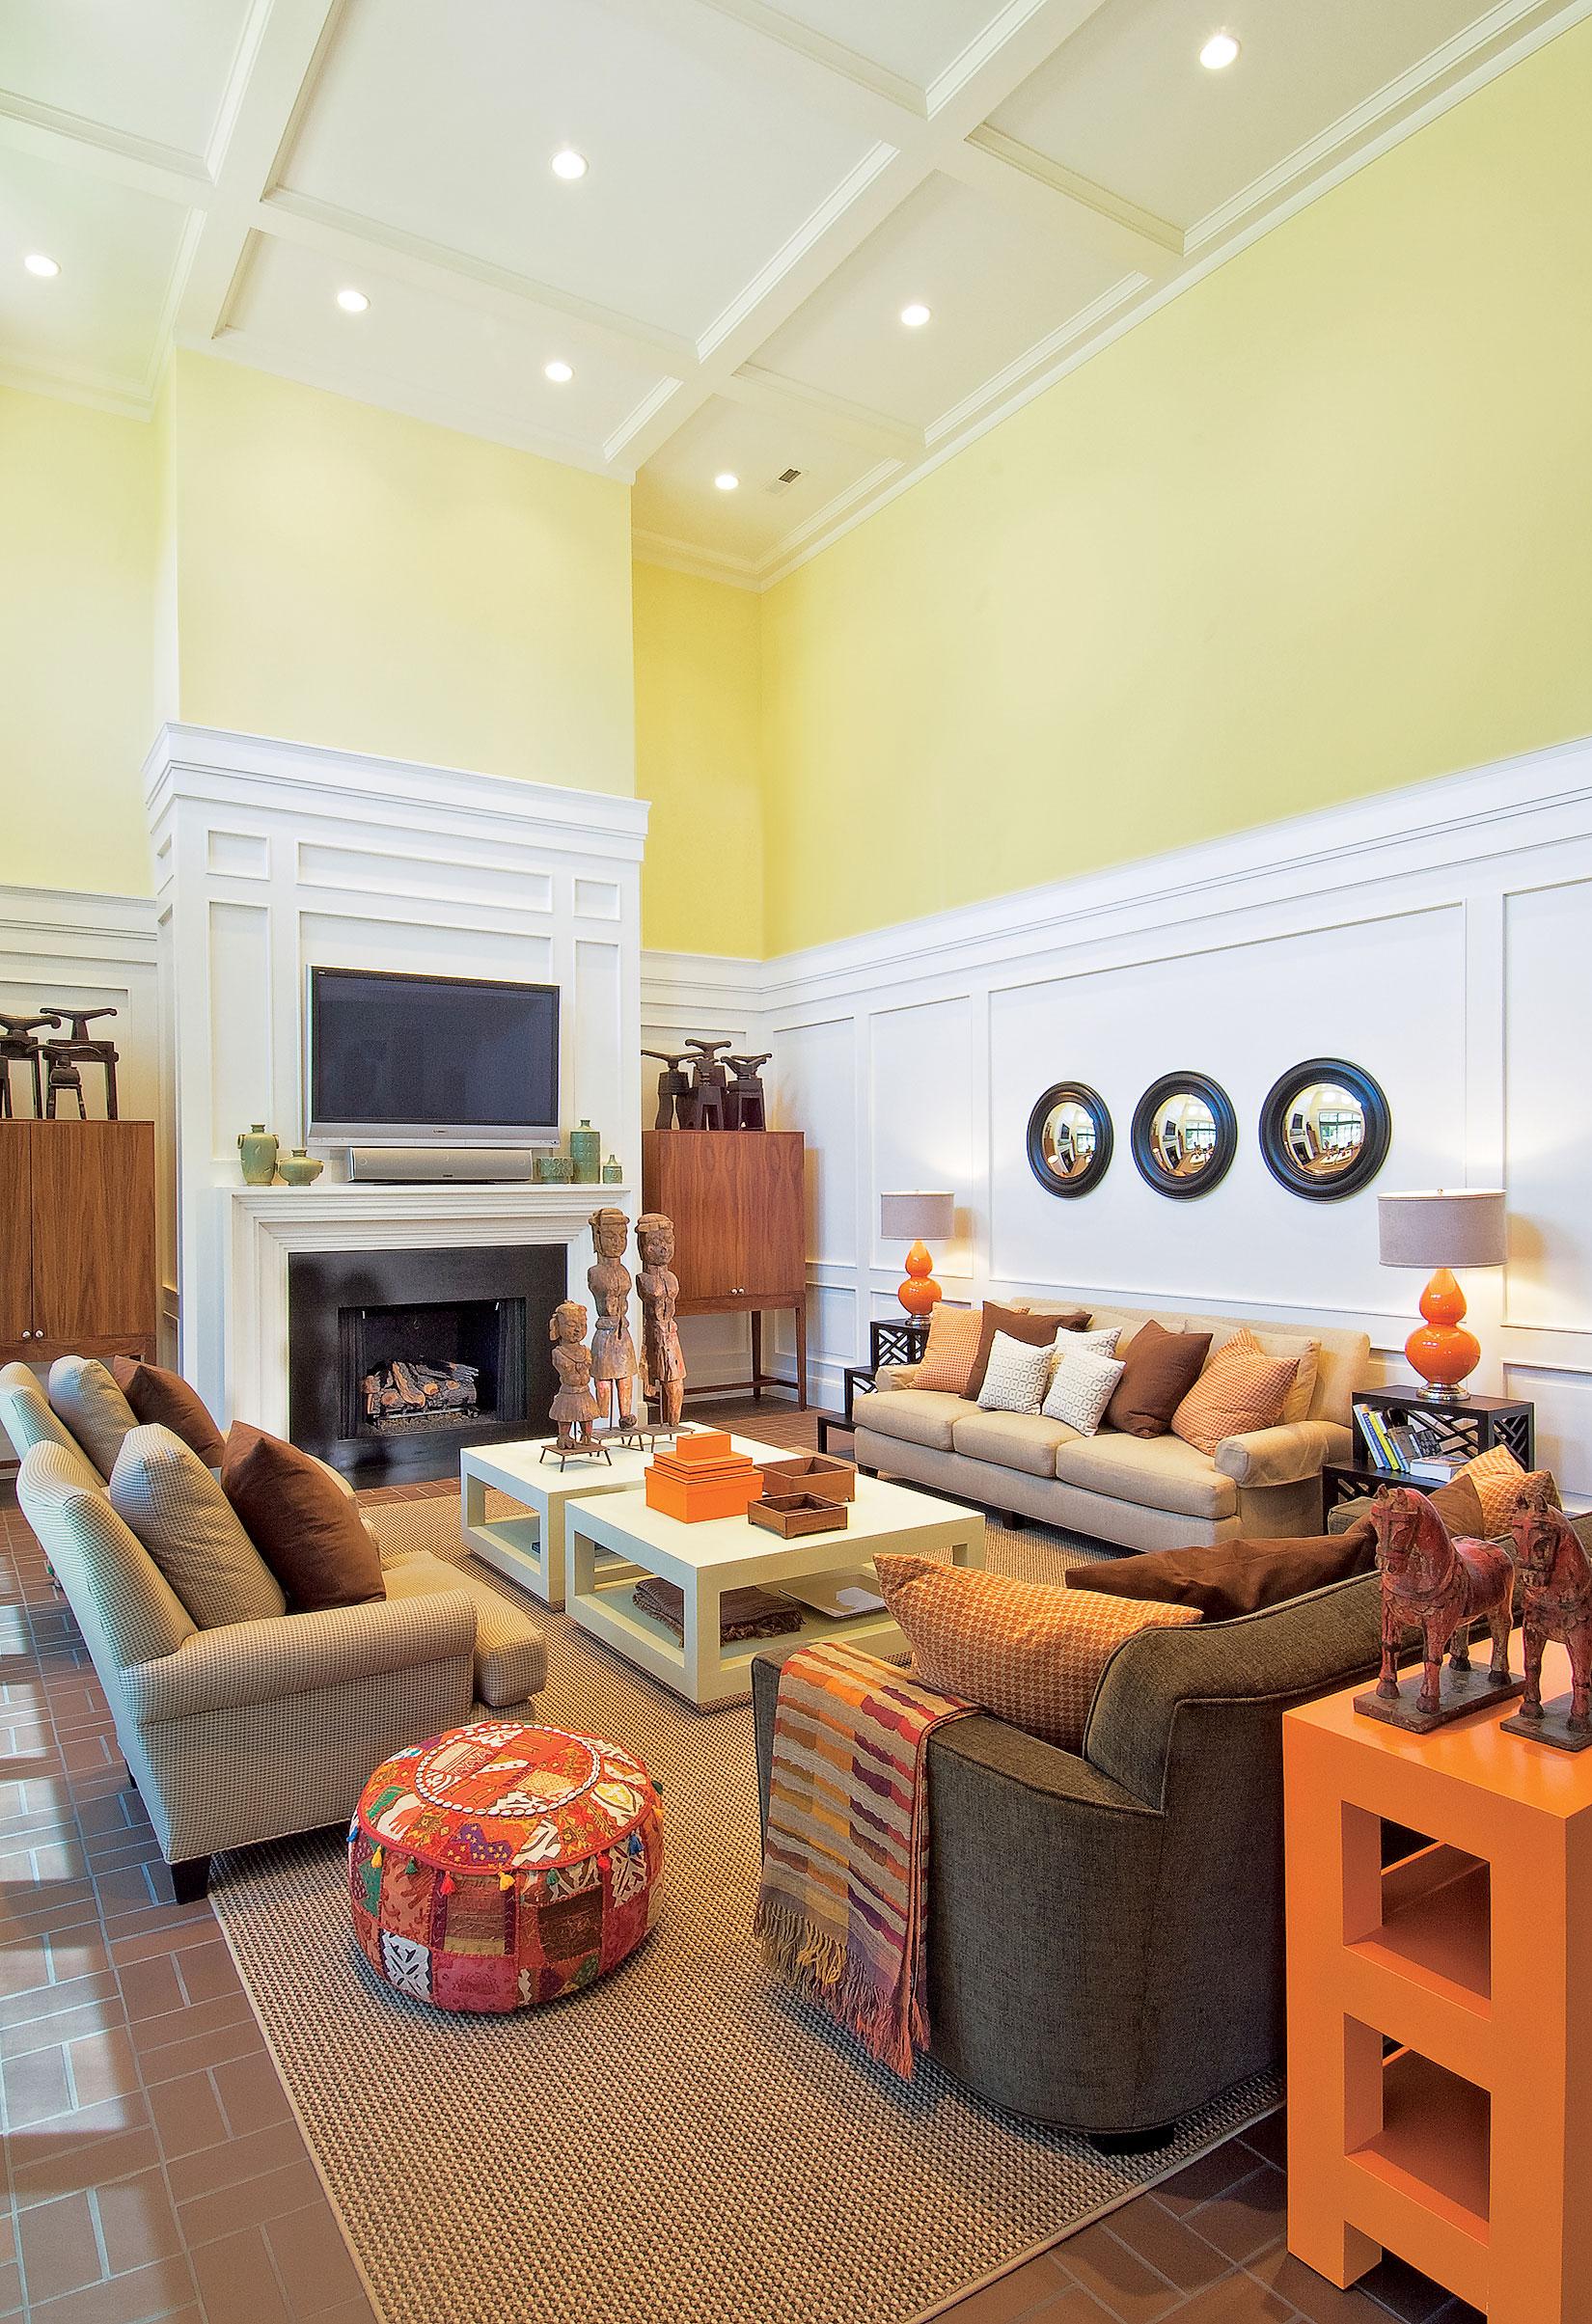 15 Family Room Ideas - Sunset Magazine